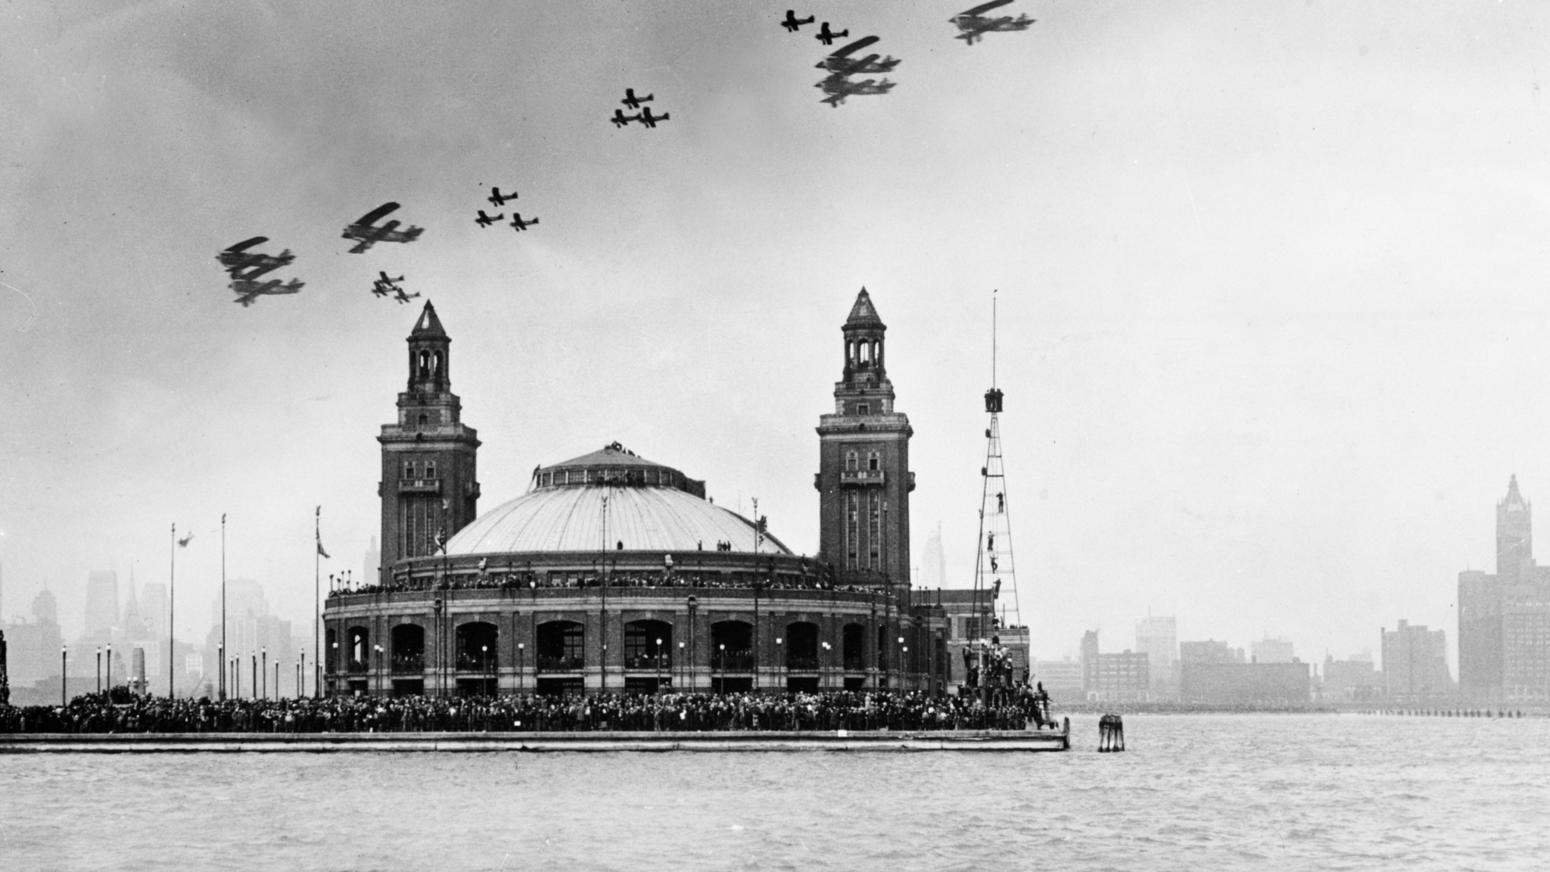 Army planes perform aerial acrobatics above Navy Pier in 1931. Chicago Tribune photo.